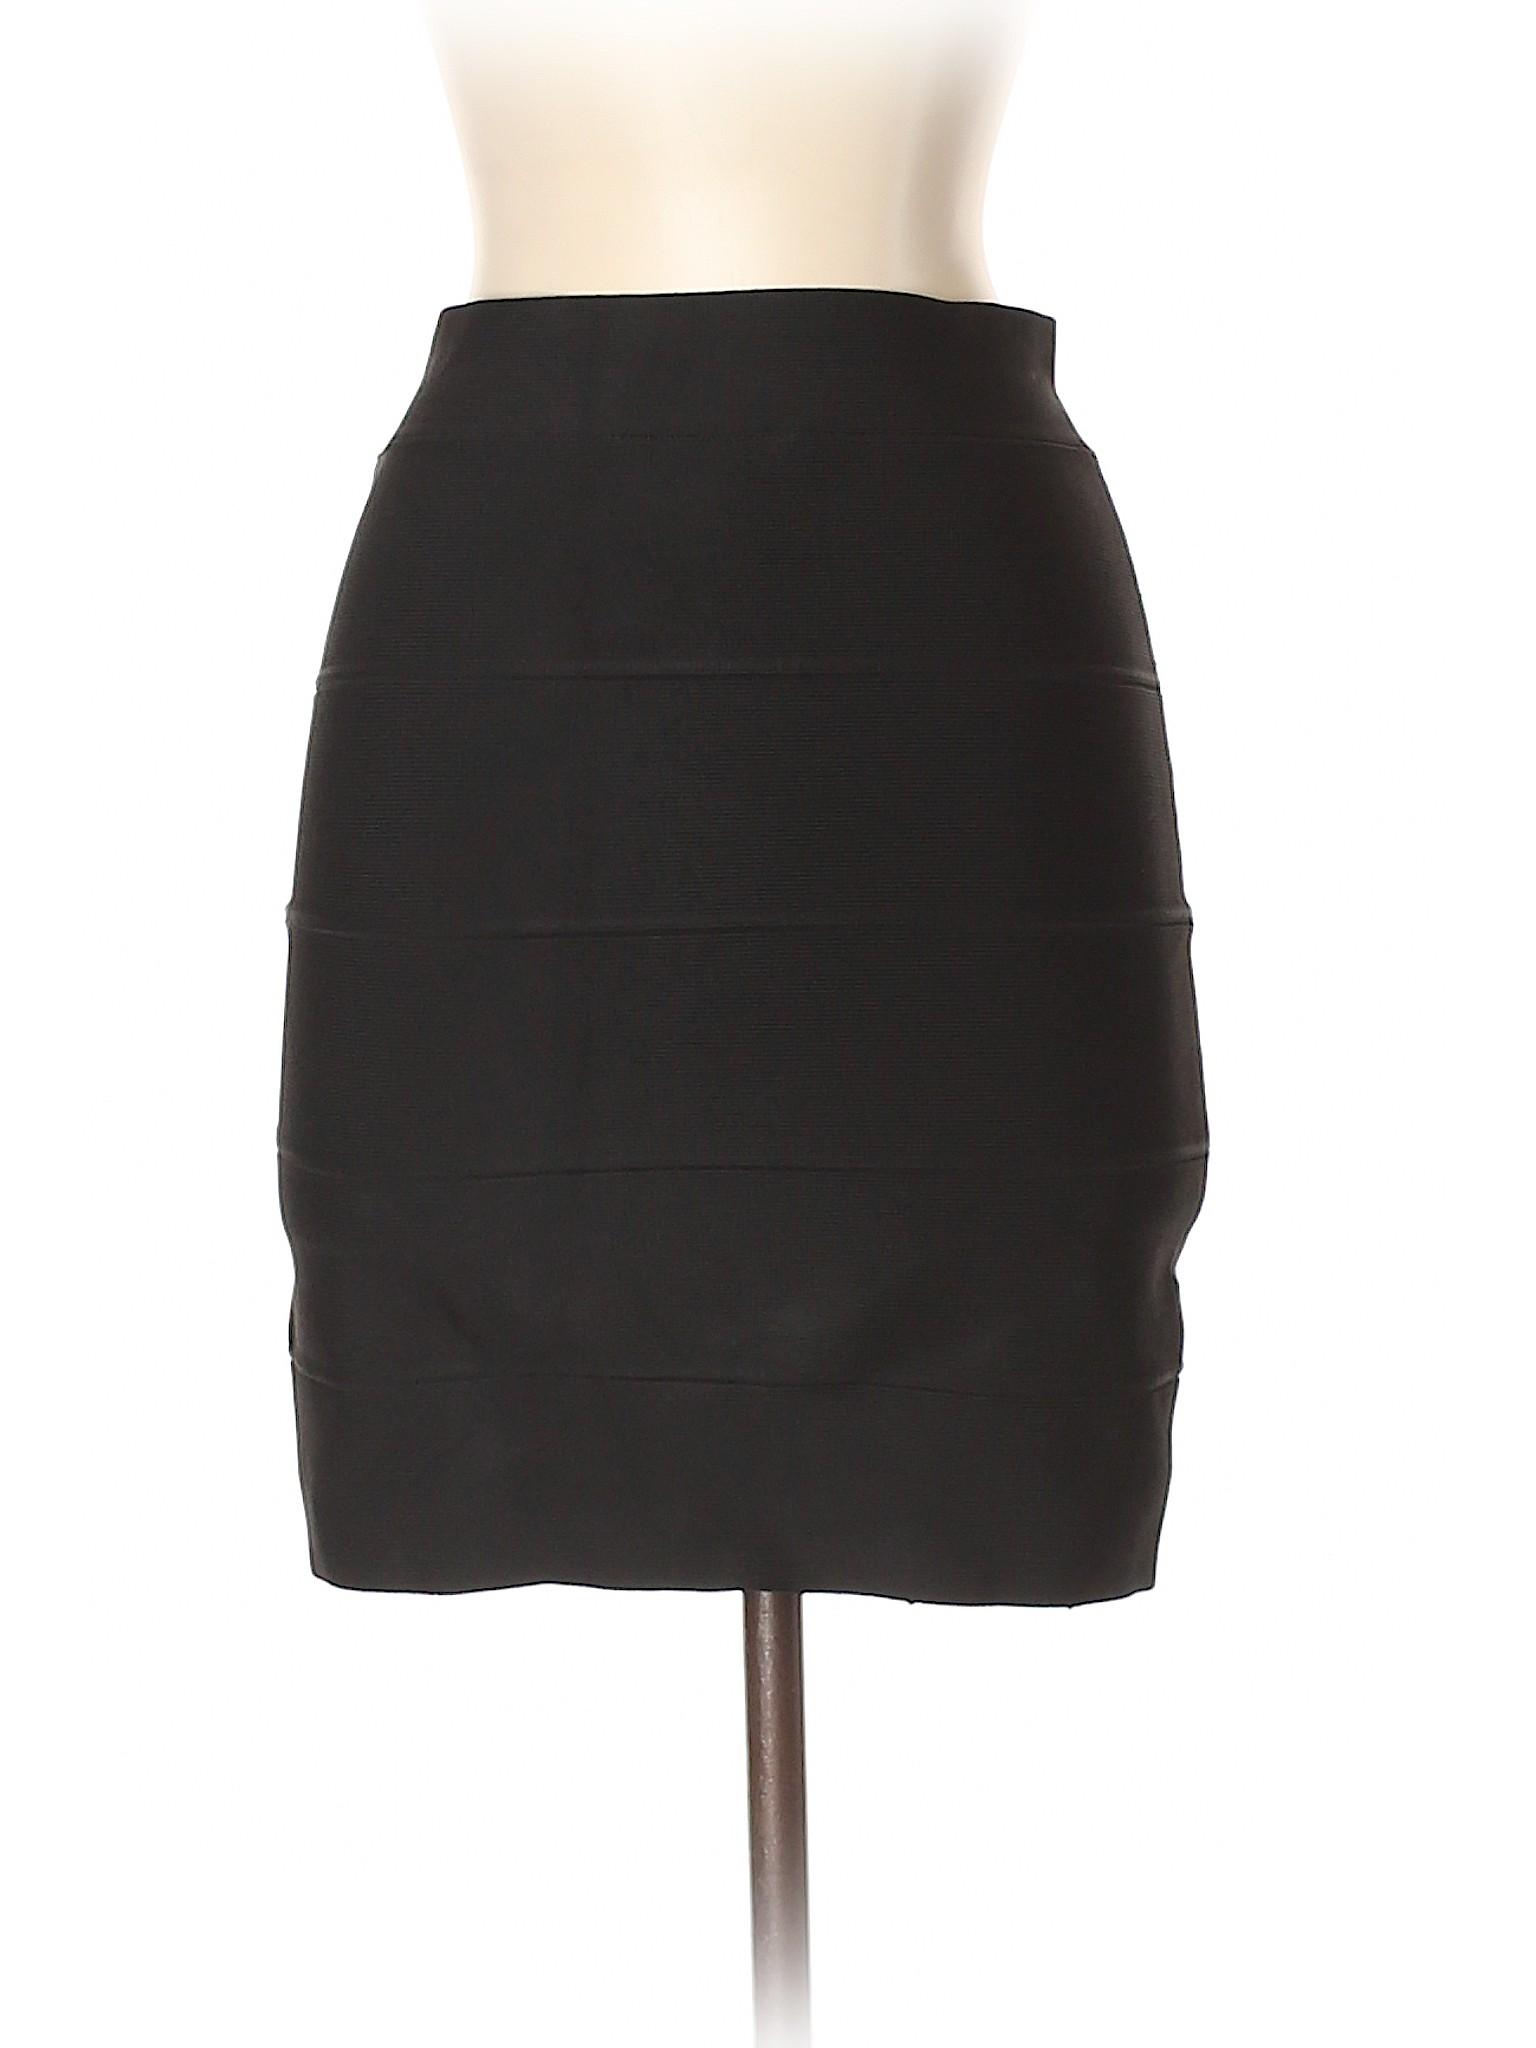 Casual Skirt Boutique Bcbgmaxazria Bcbgmaxazria Boutique qwax1nRvp6